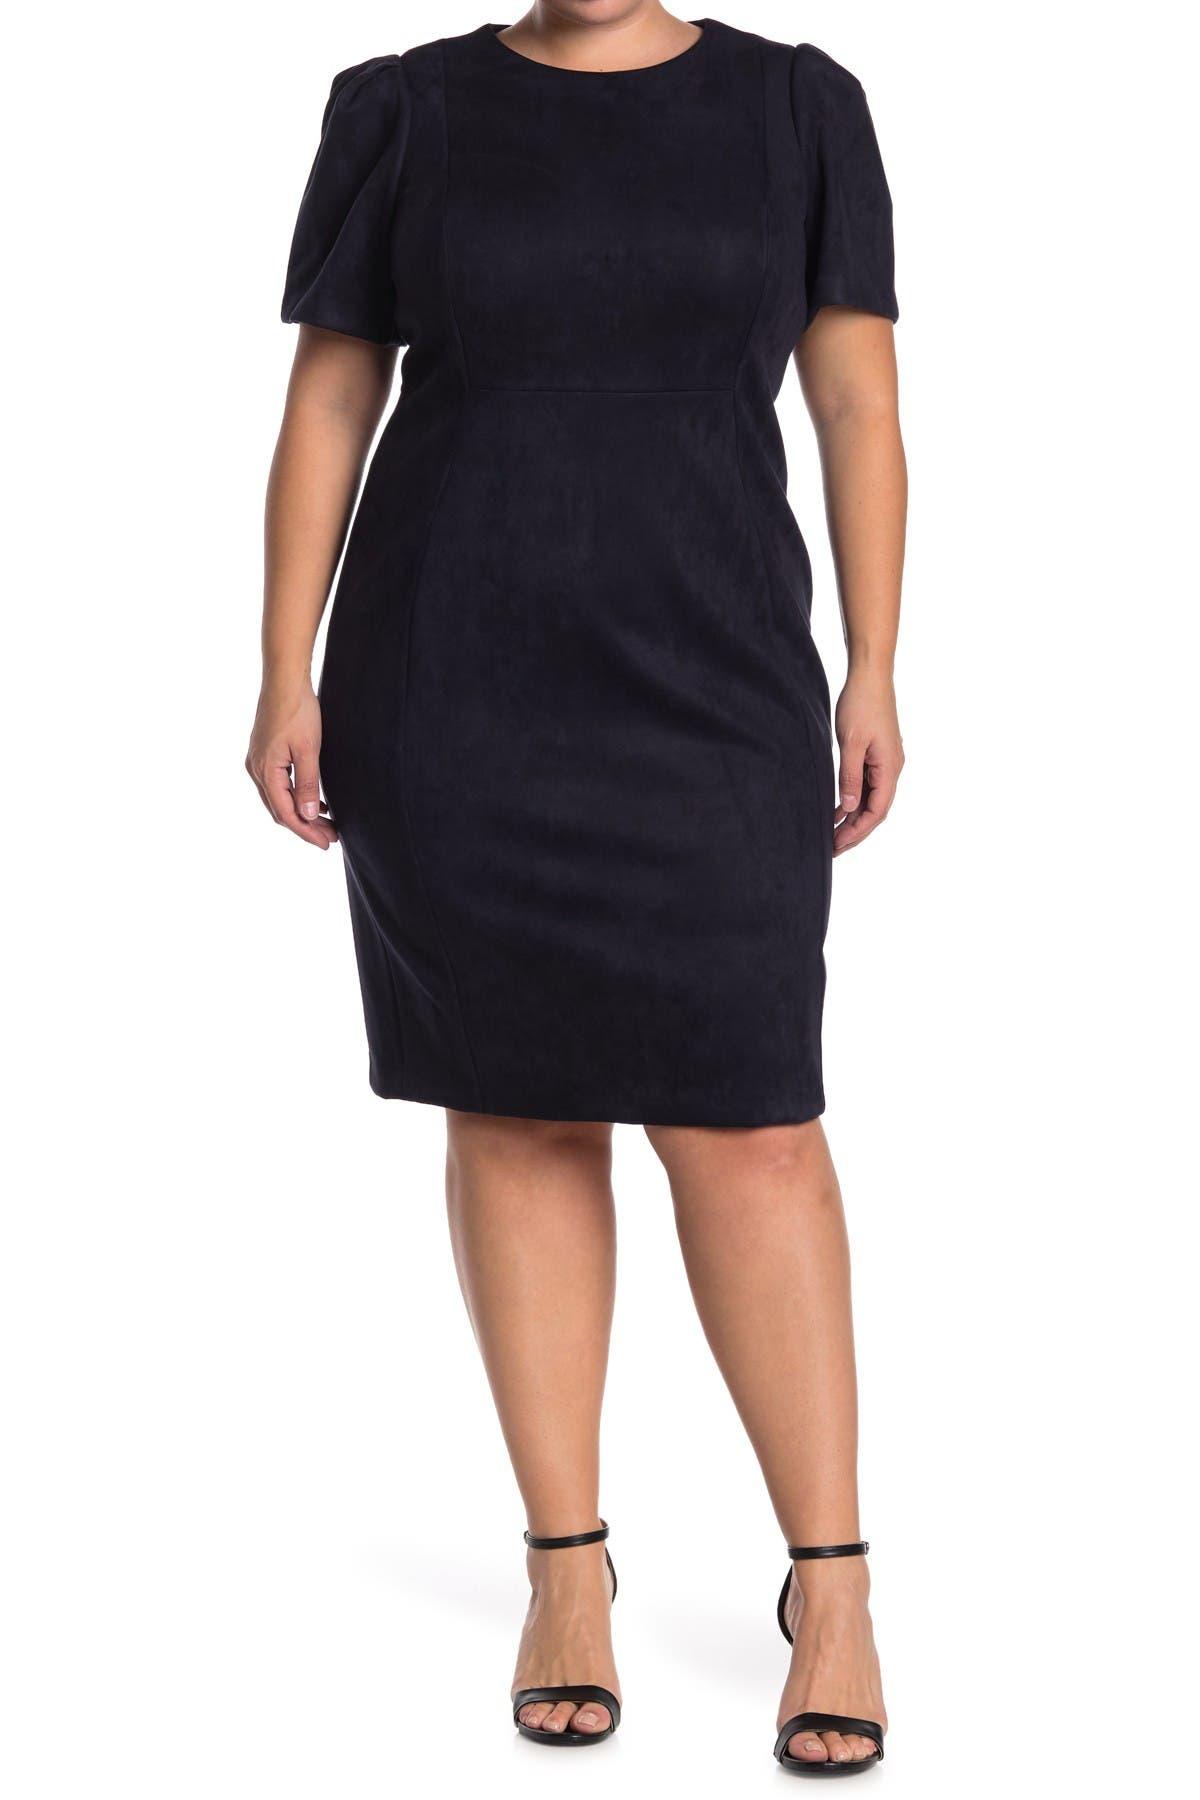 Image of Calvin Klein Faux Suede Short Sleeve Sheath Dress